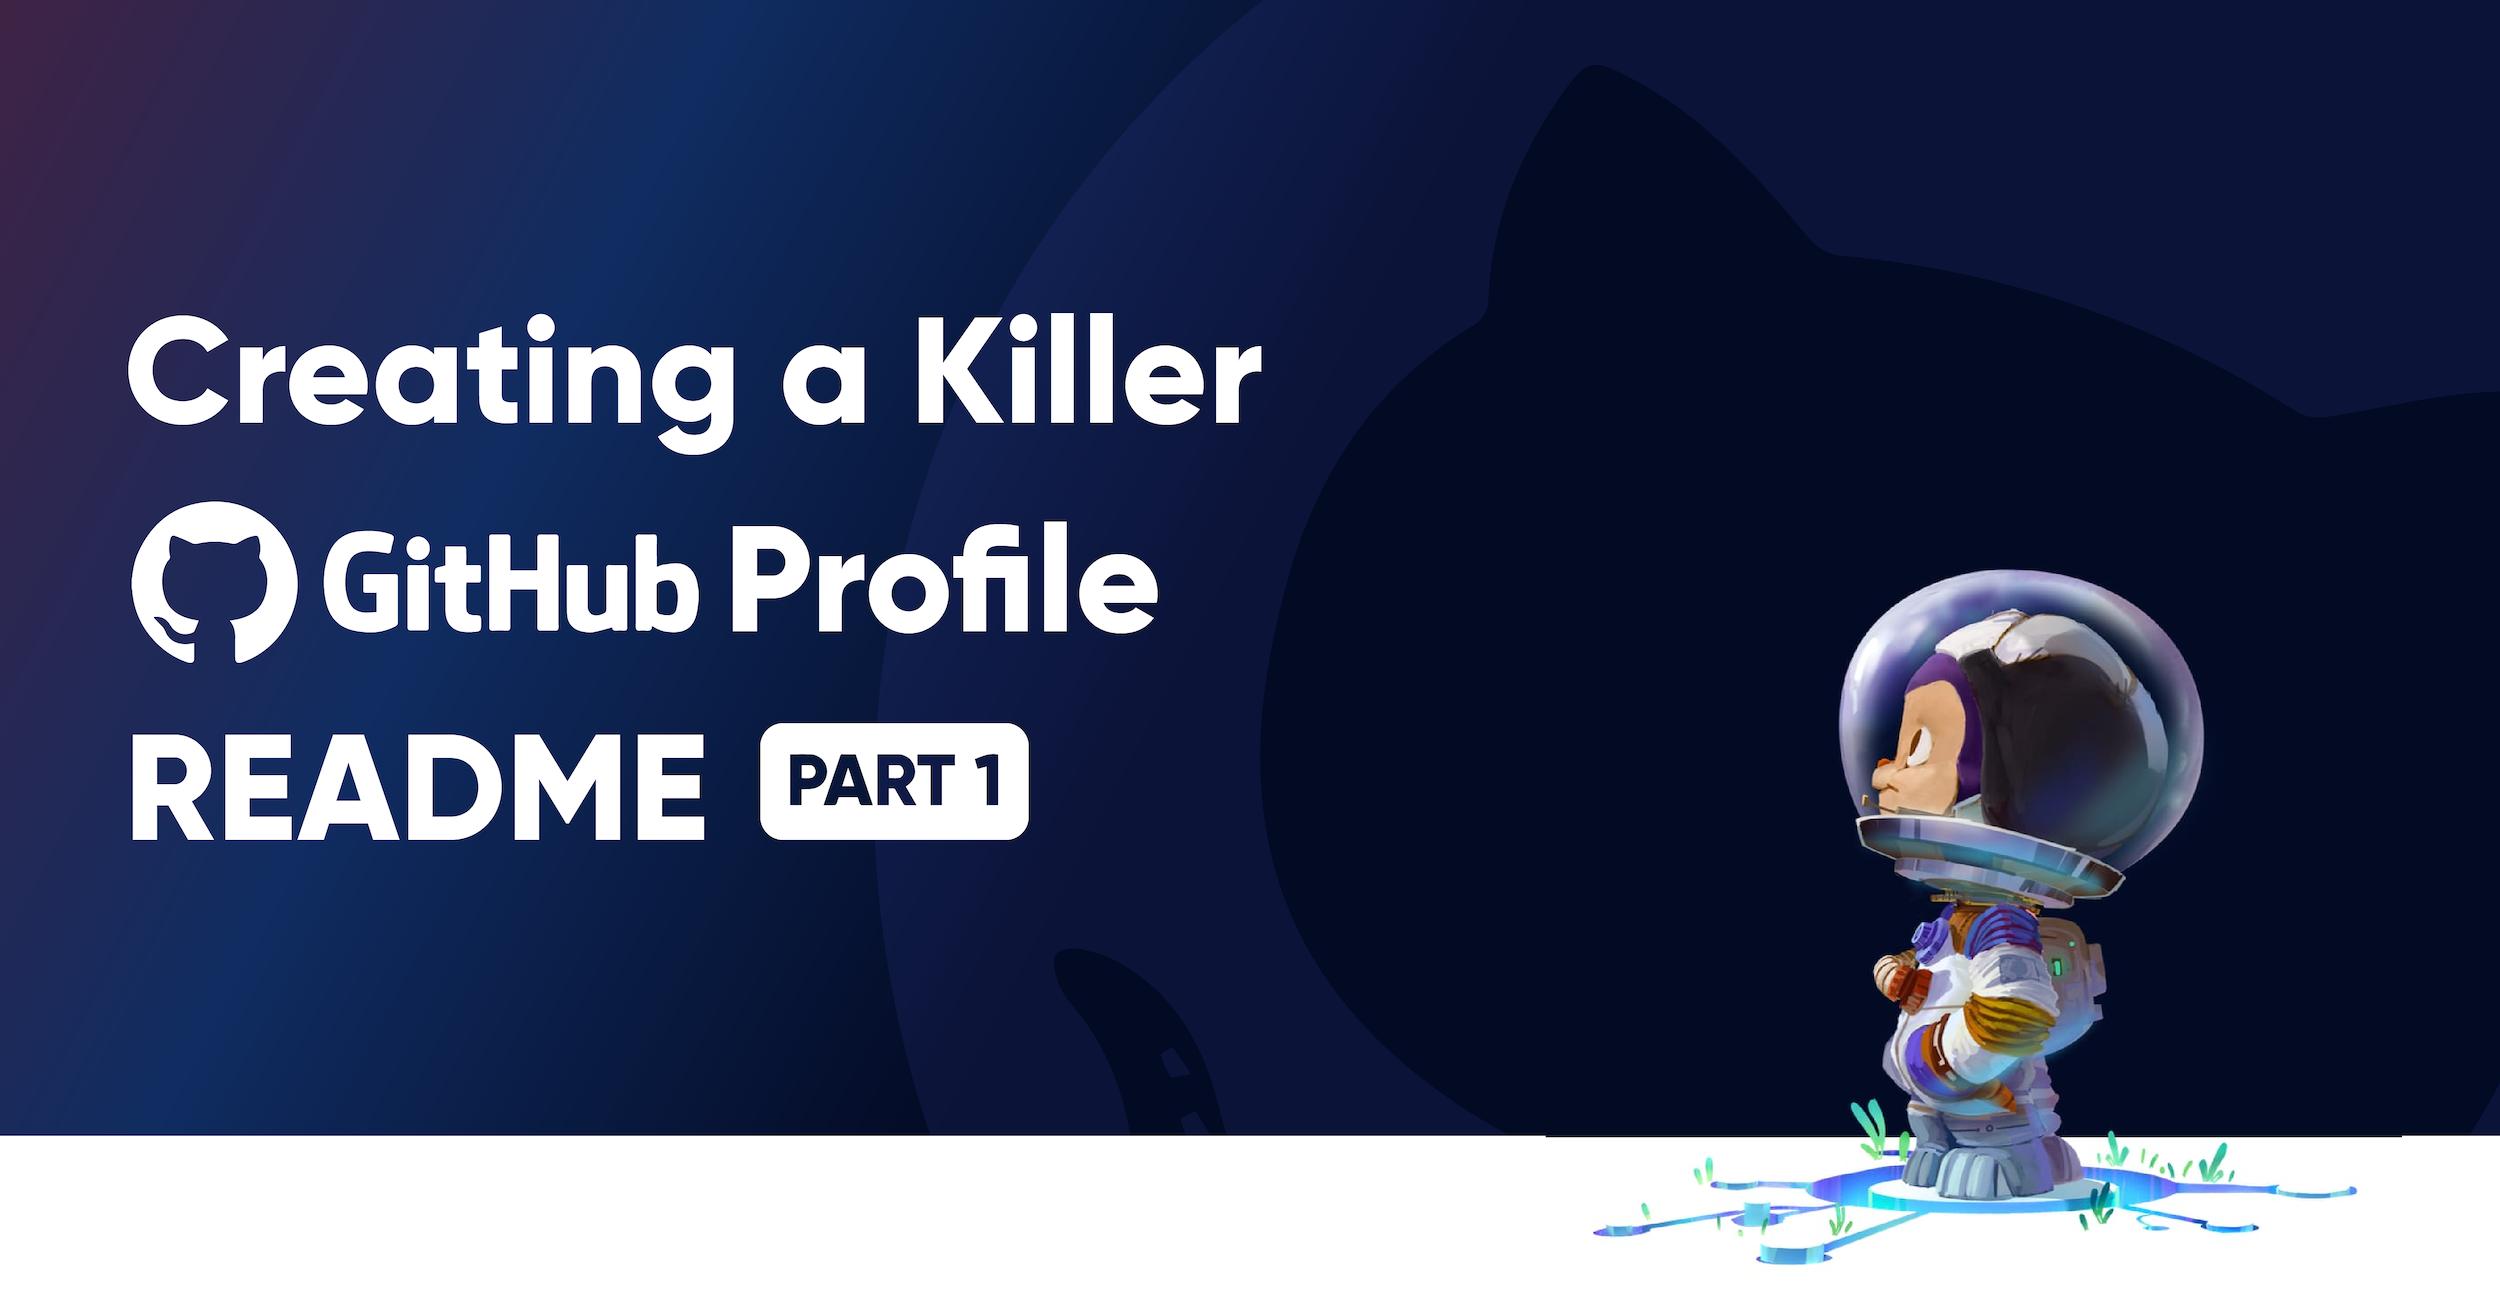 Creating a Killer GitHub Profile README Part 1